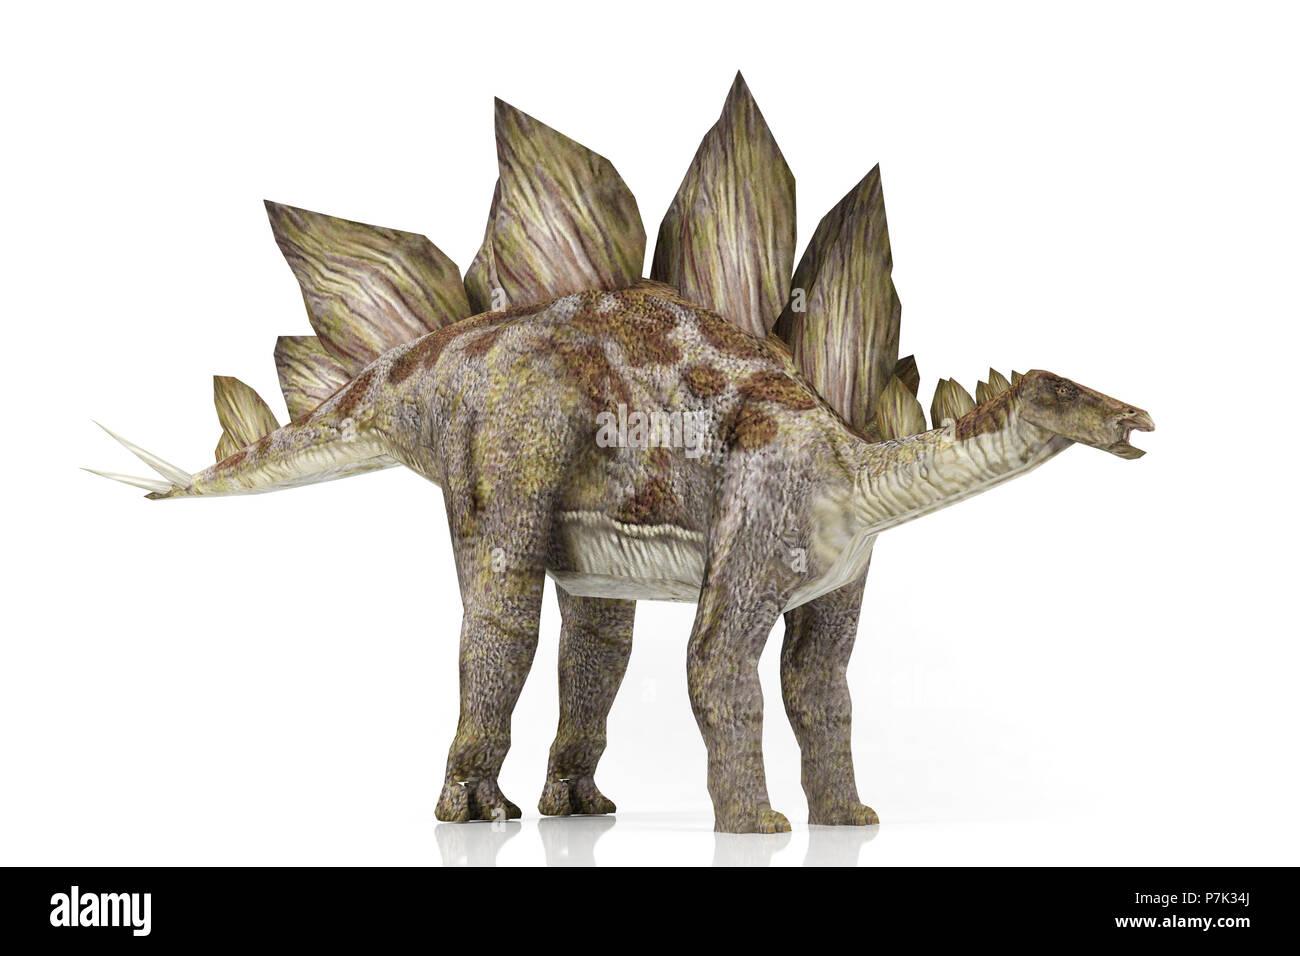 Stegosaurus isolated on white background, 3D rendering - Stock Image